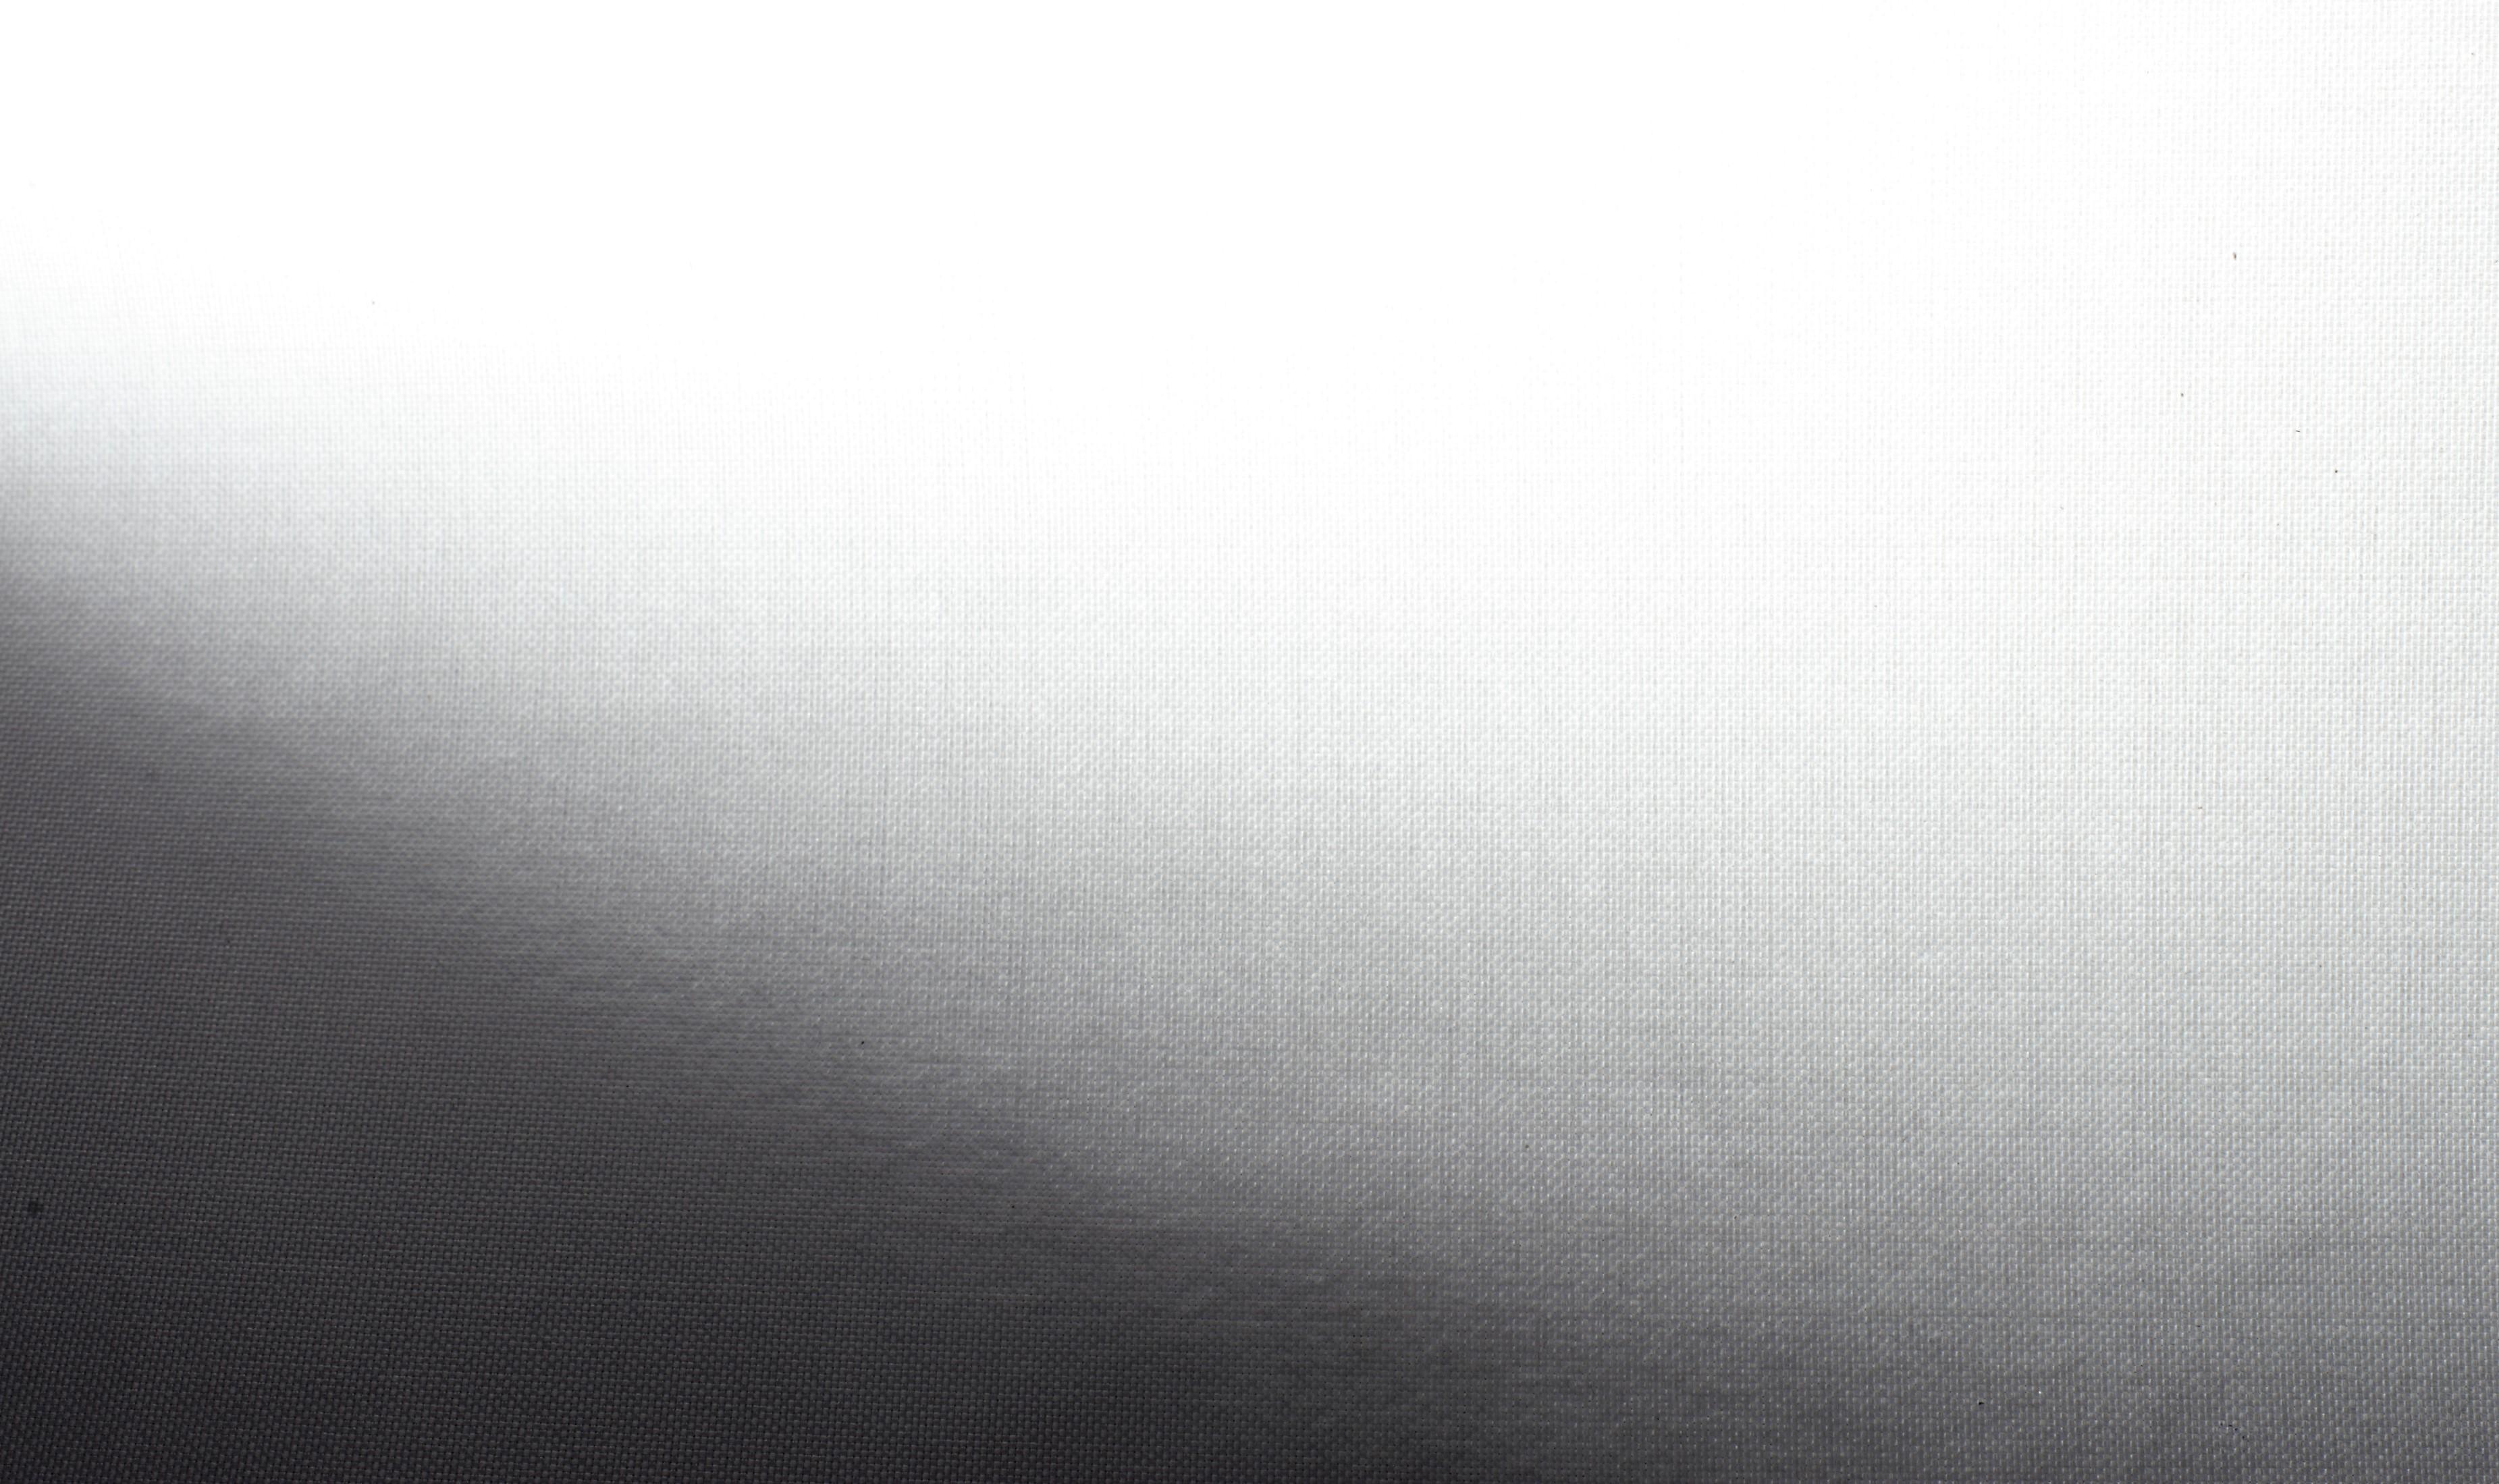 PTFE Ultralight Architectural Fabric